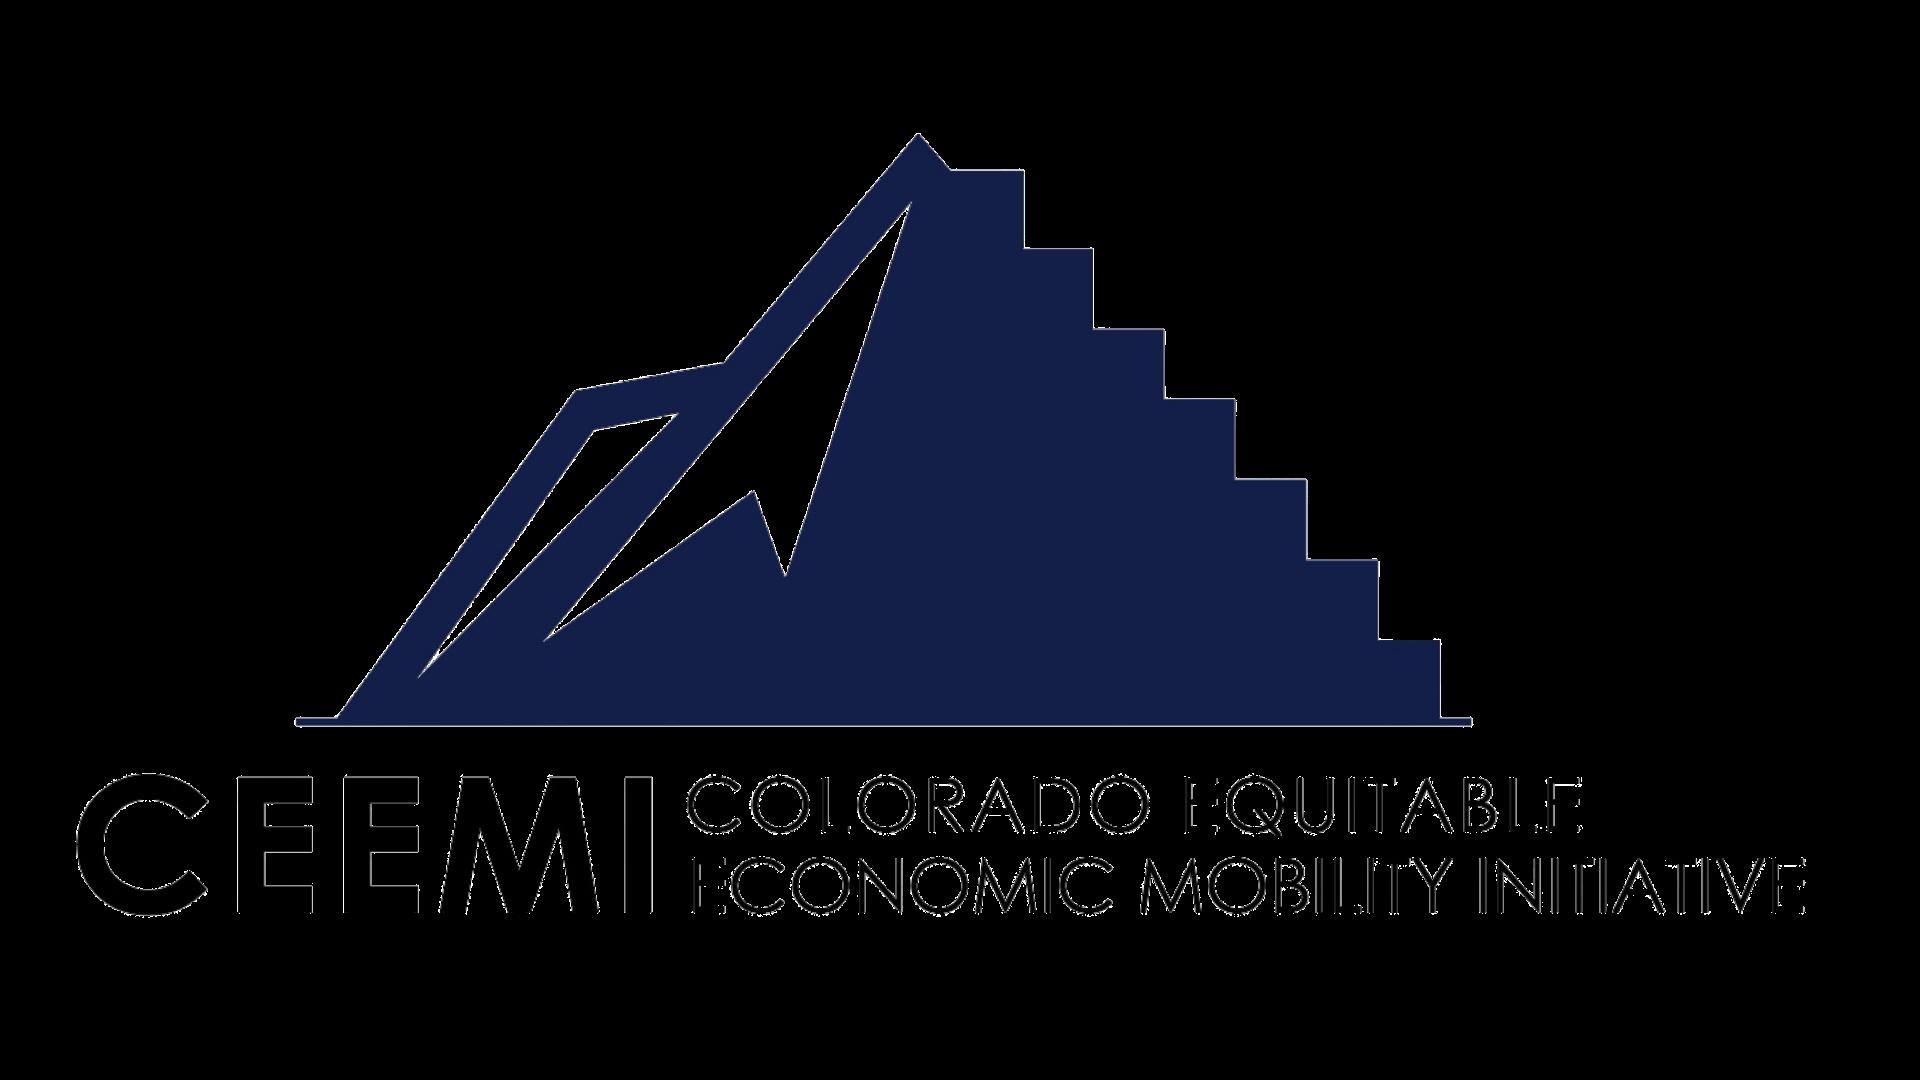 Colorado Equitable Economic Mobility Initiative